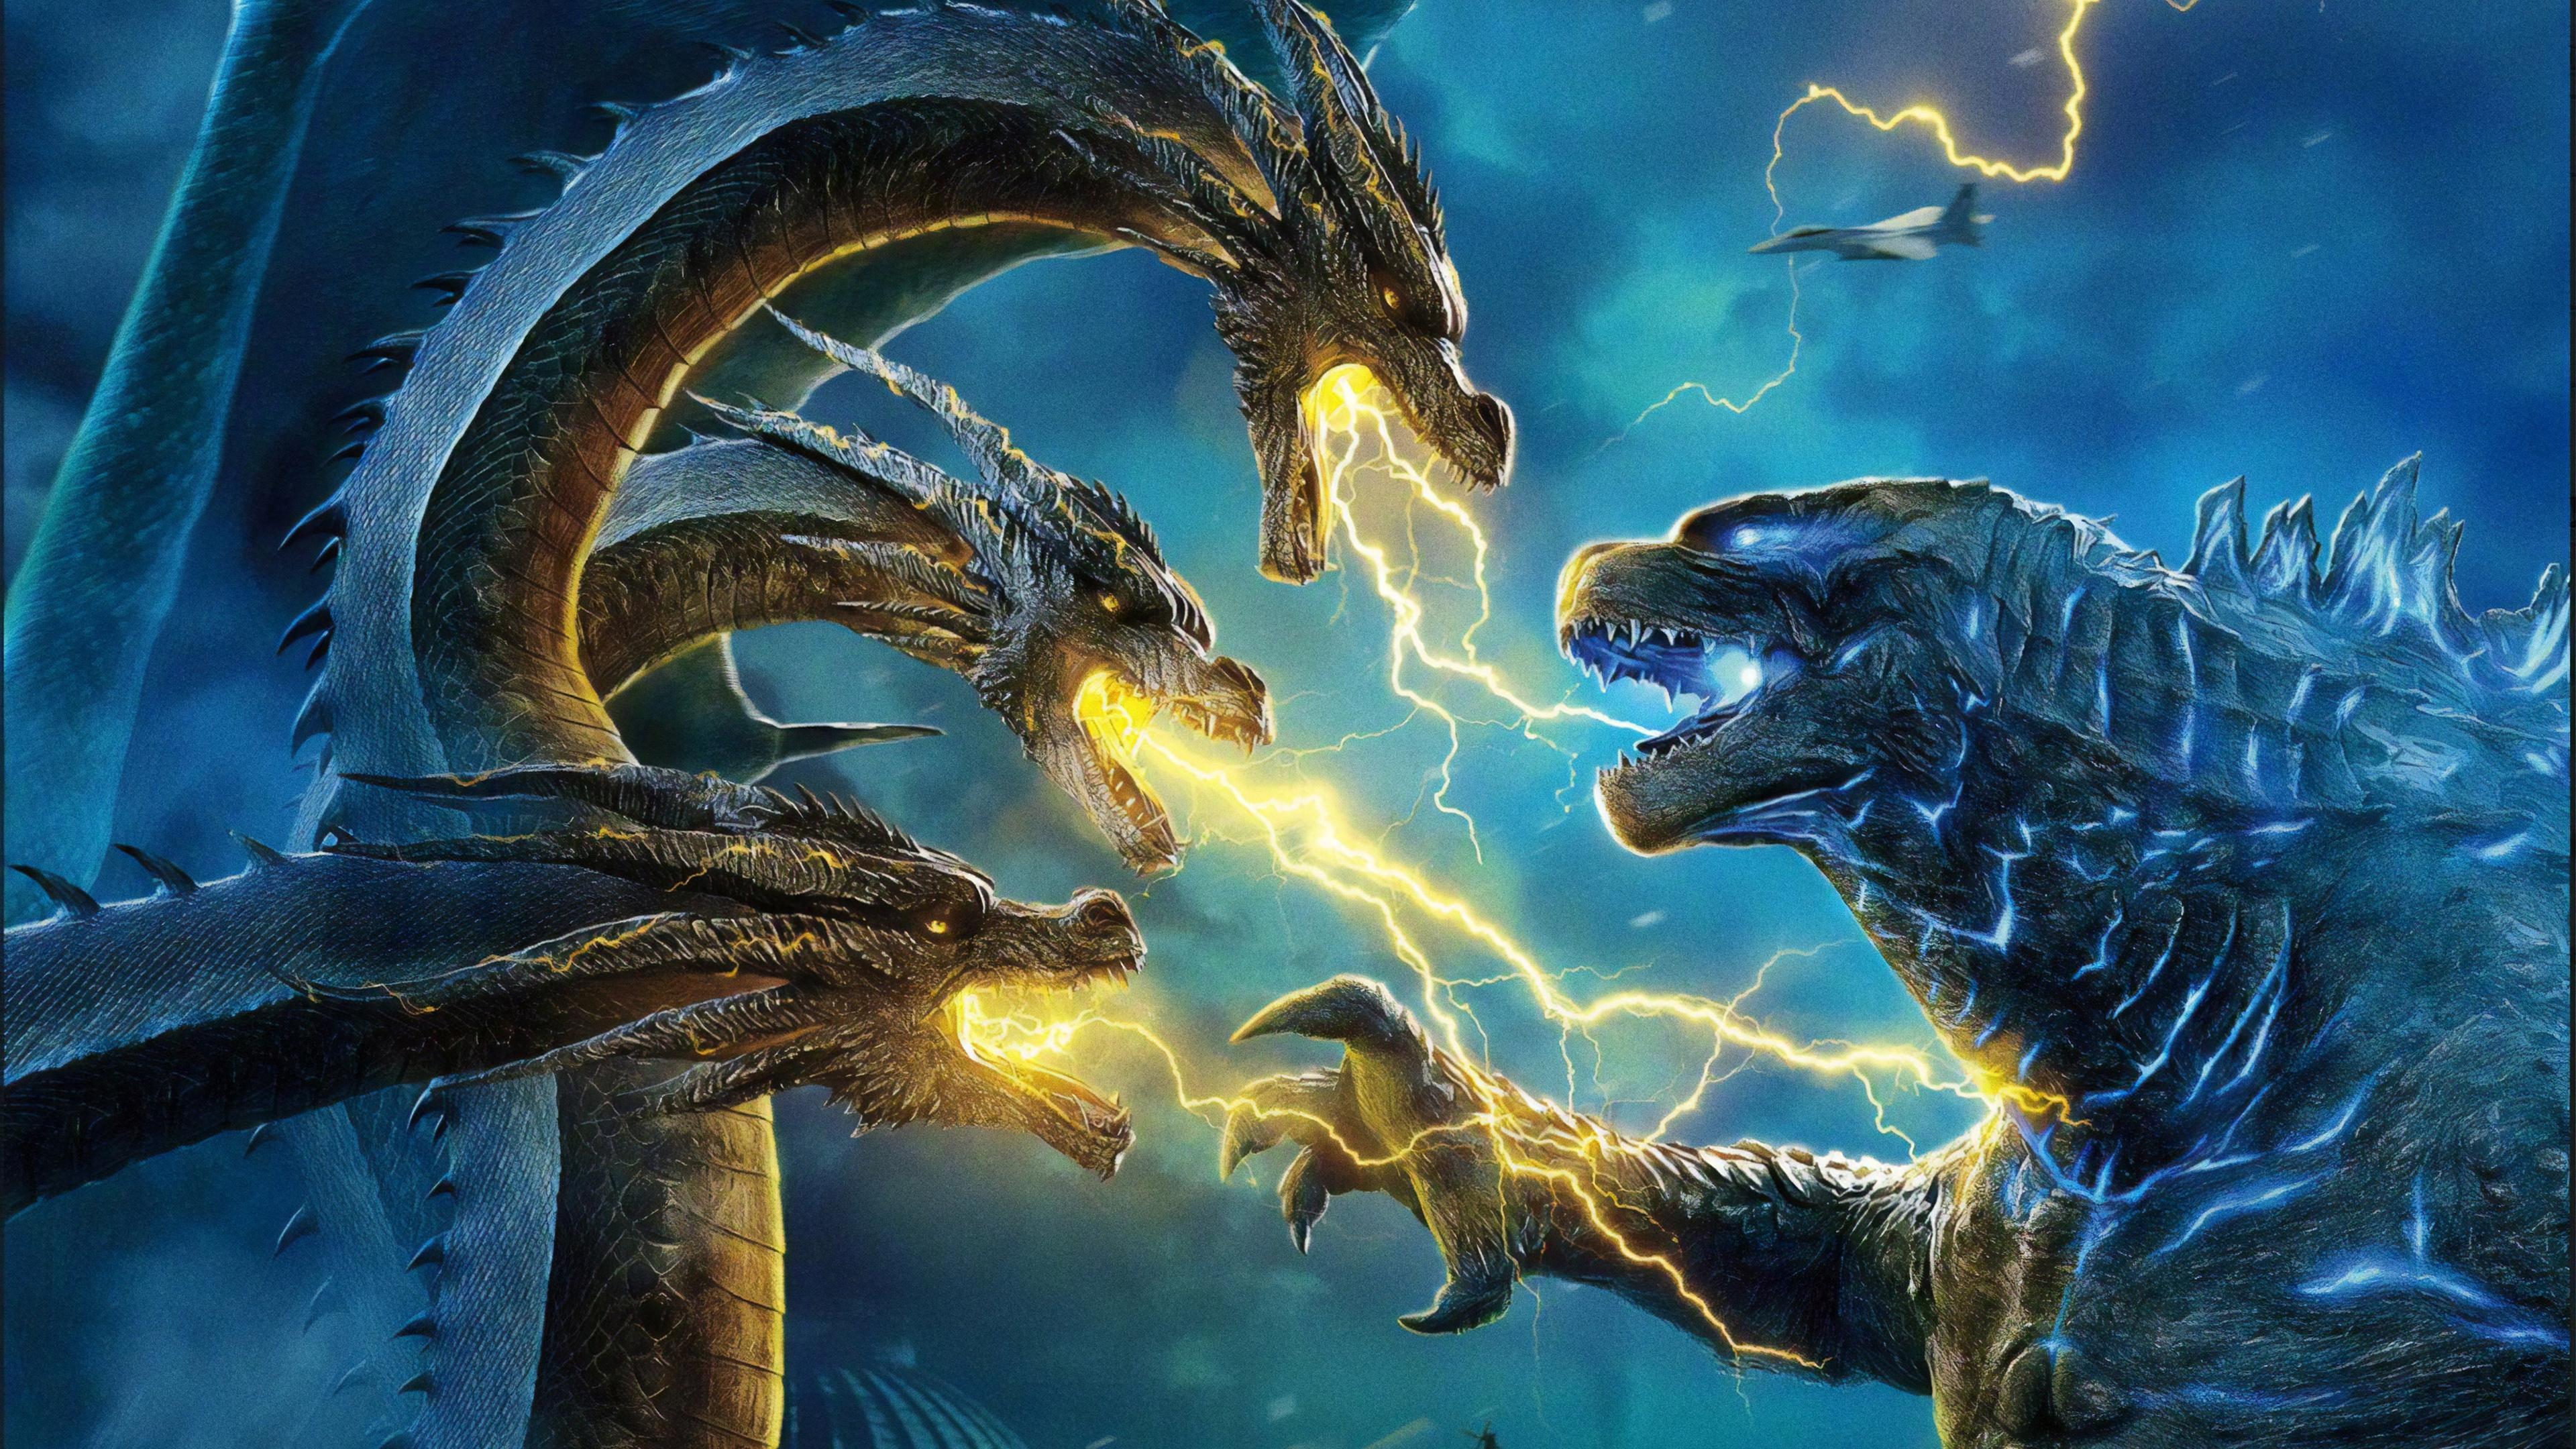 Godzilla Vs King Ghidorah Wallpapers Wallpaper Cave